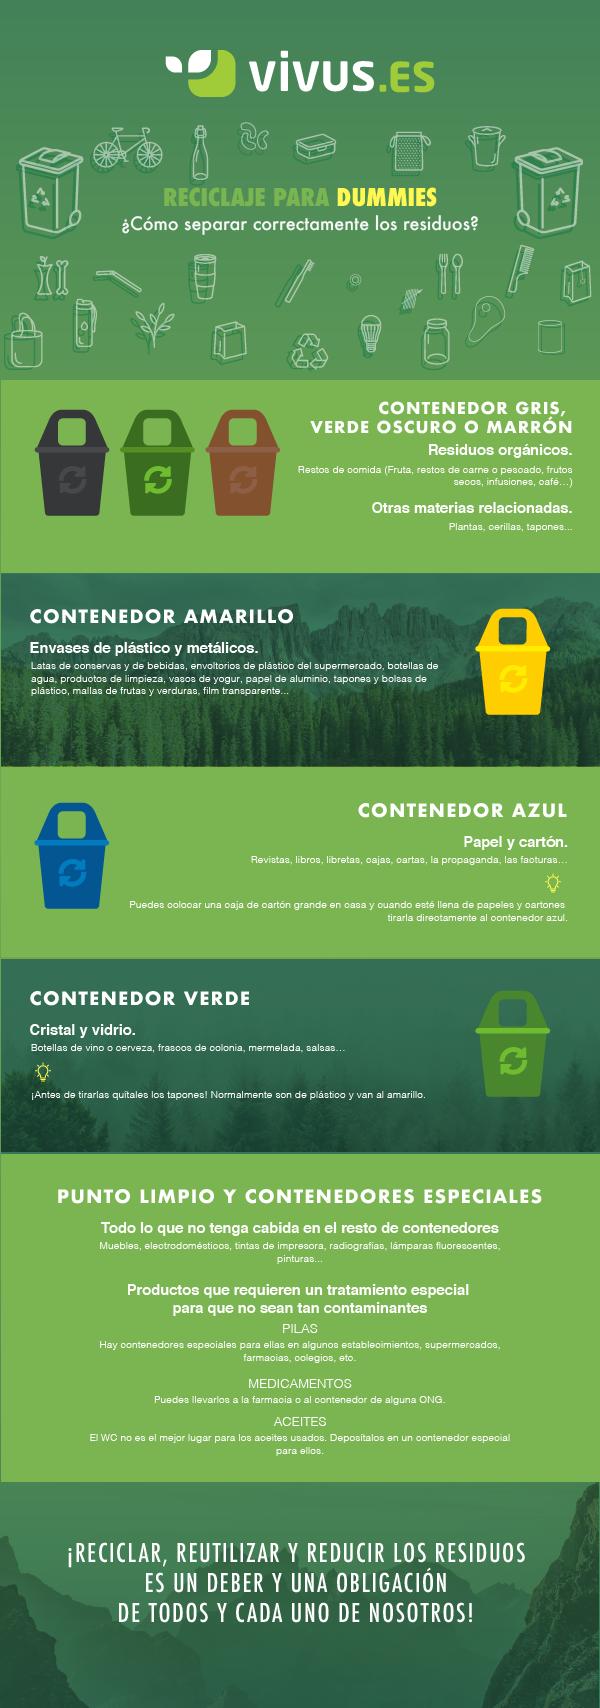 infografia_vivus_Reciclaje_para_dummies